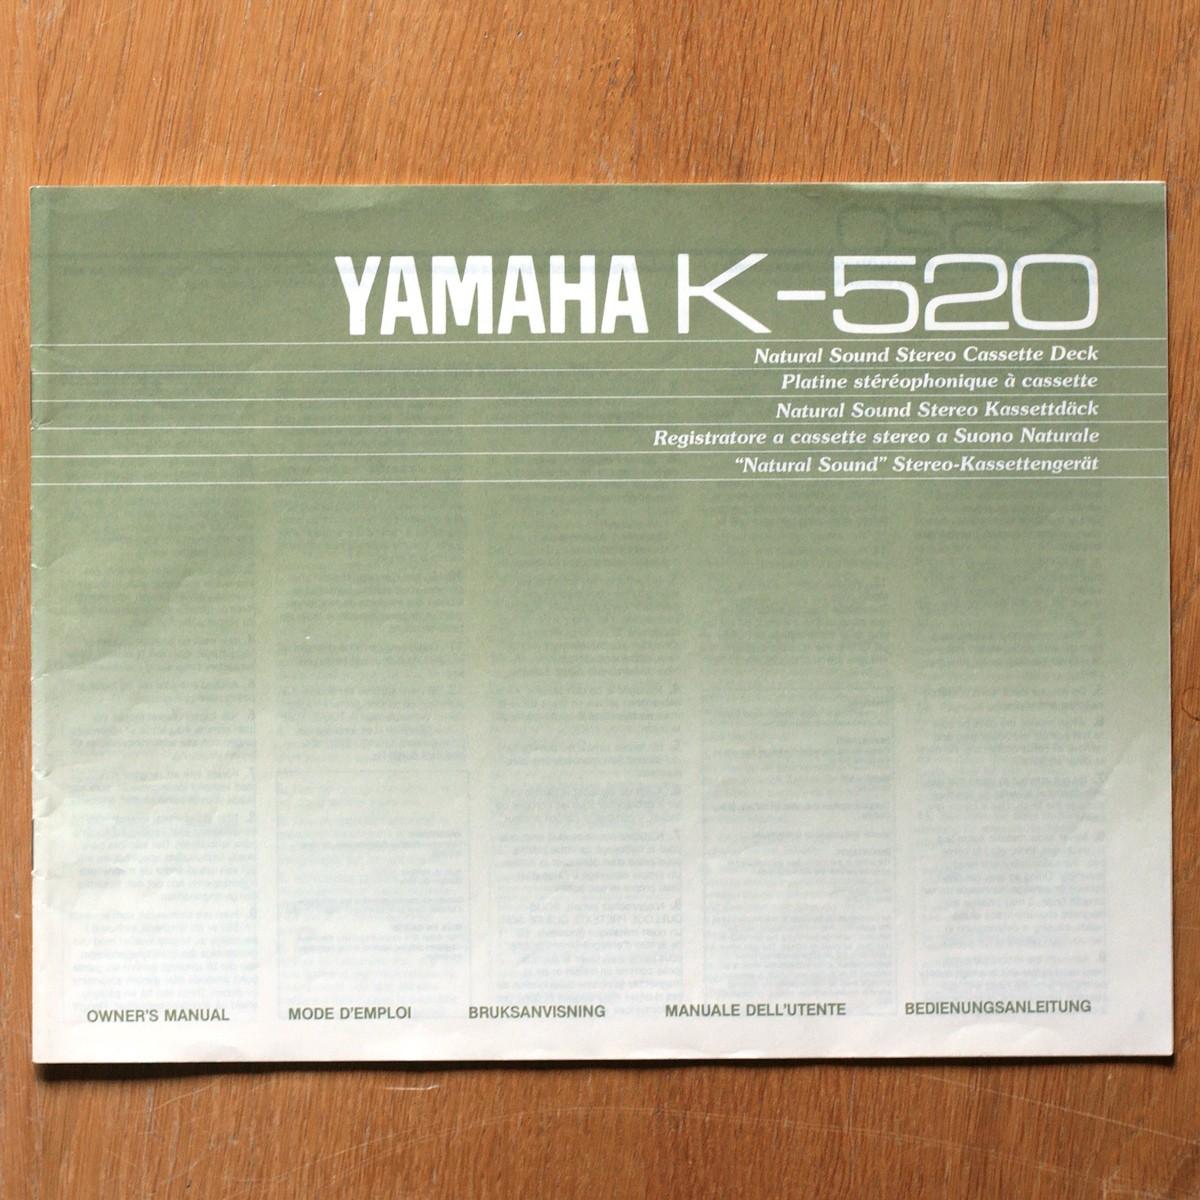 Yamaha • Magnétophone à cassettes • K-520 • Manuel utilisateur • Owner's manual • Bruksanvisning • Manuale dell'utente • Bedienungsanleitung